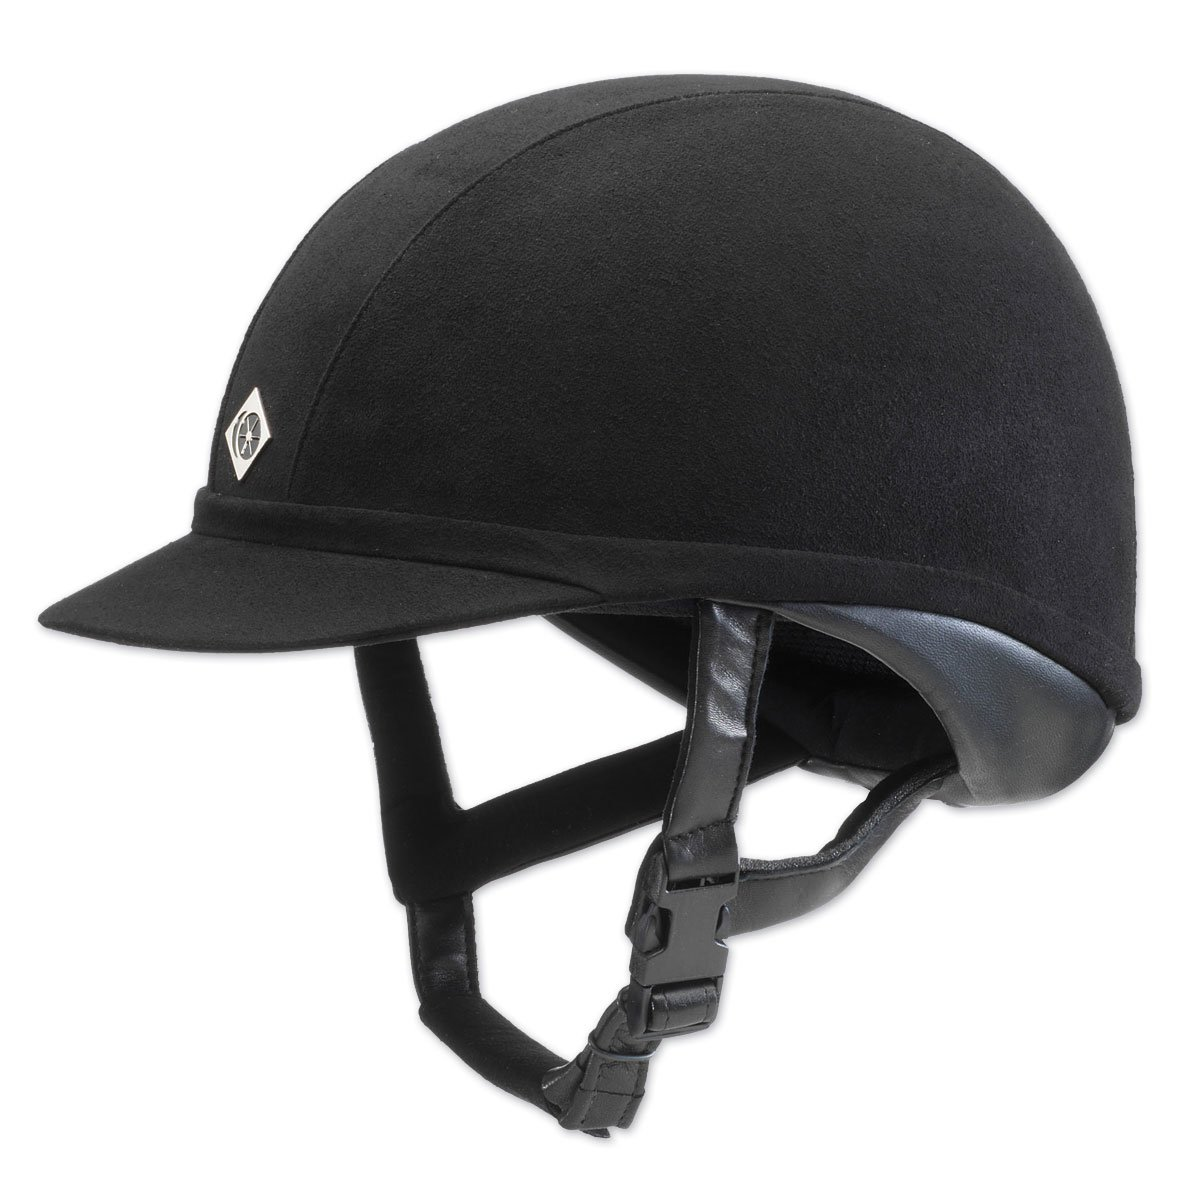 Charles Owen Wellington Professional Riding Hat Black 65cm